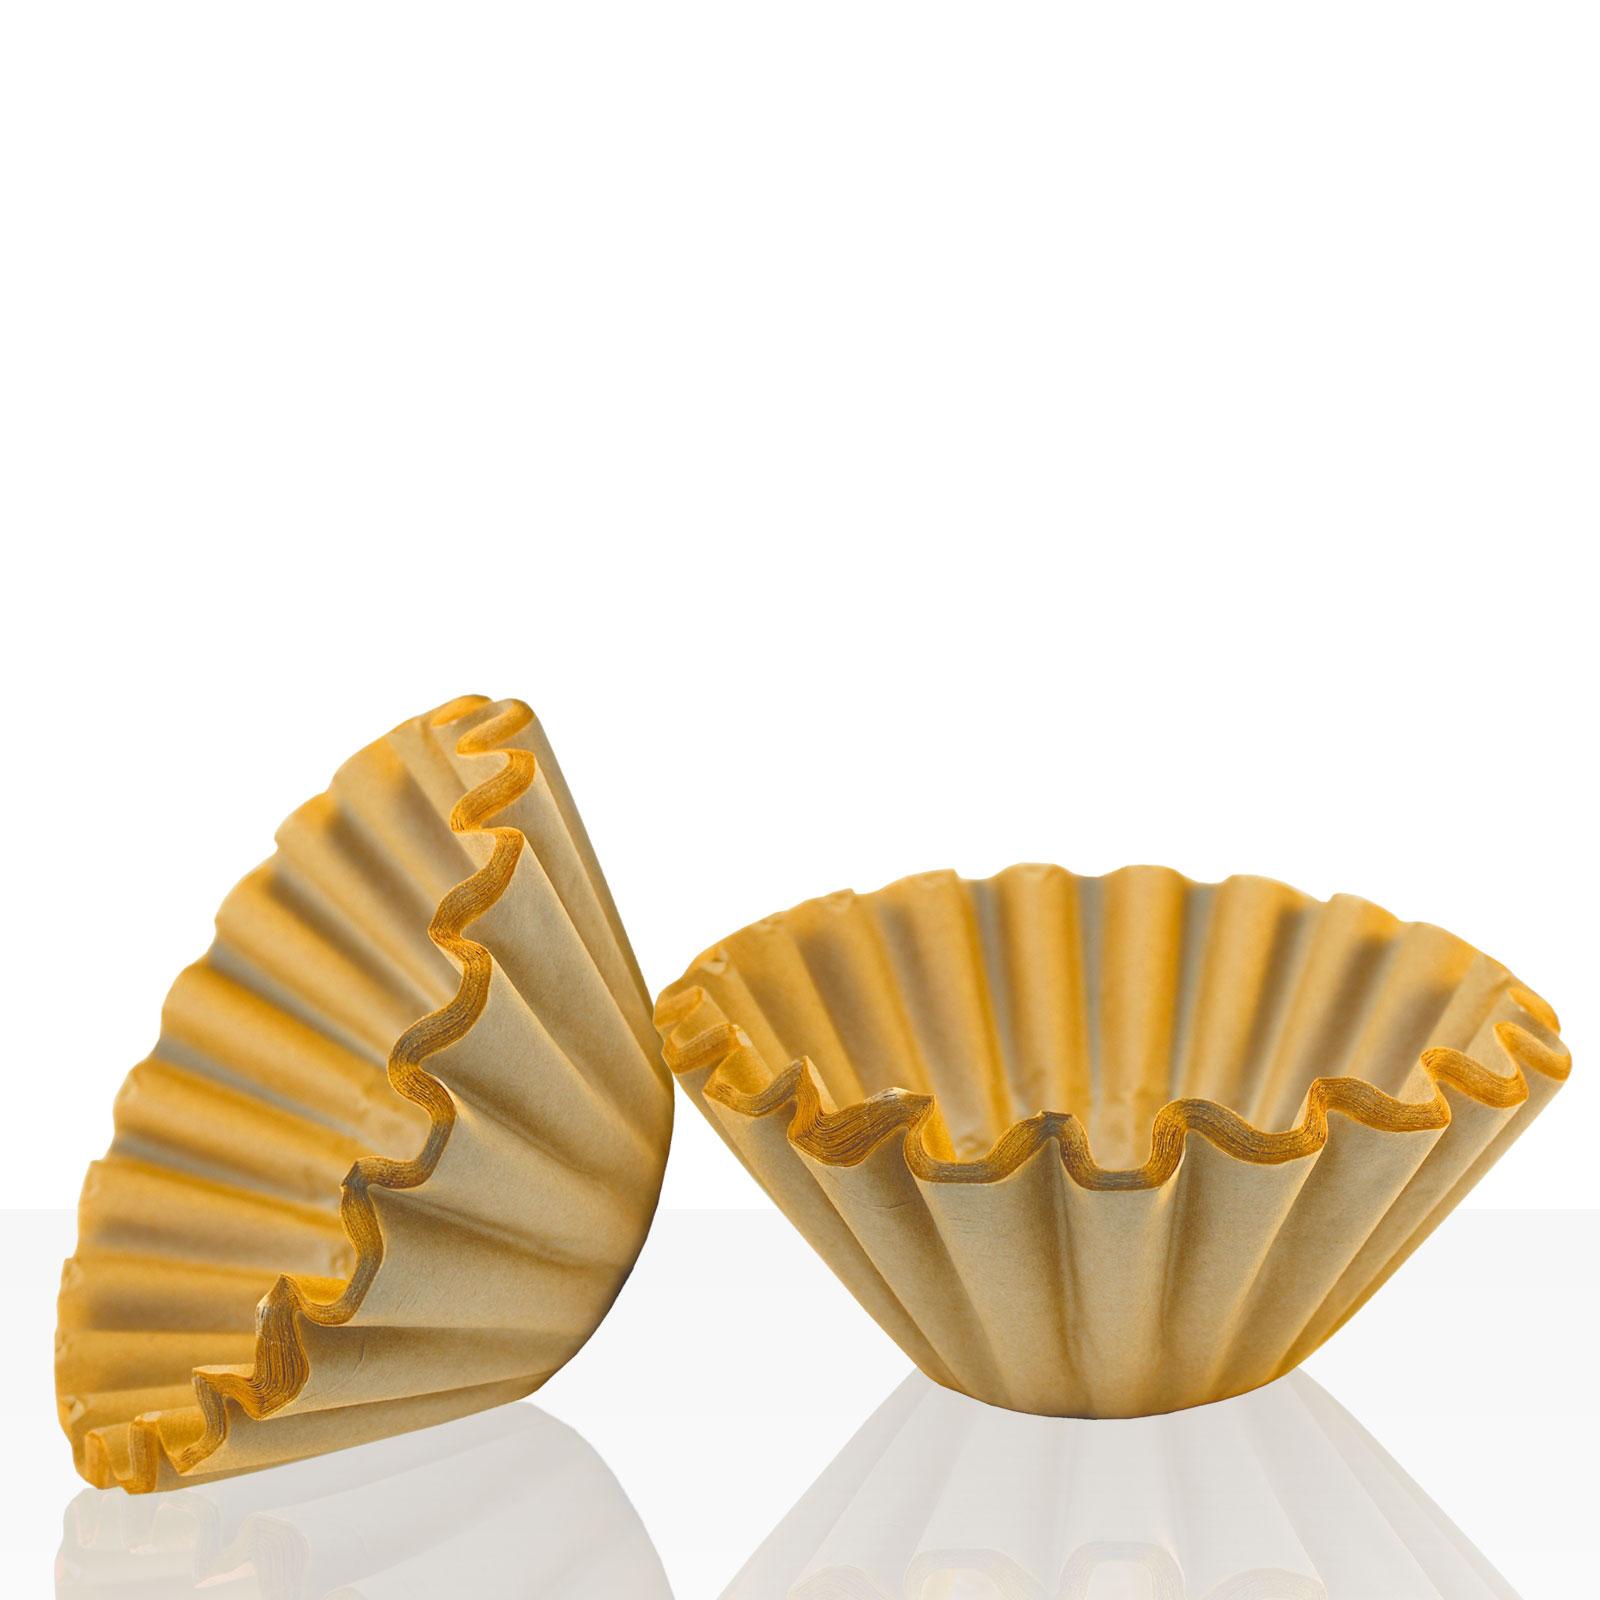 Korbfilter für Bonamat, Bartscher, Animo 85/245 mm, 50 Stk braun, Kaffeefilter